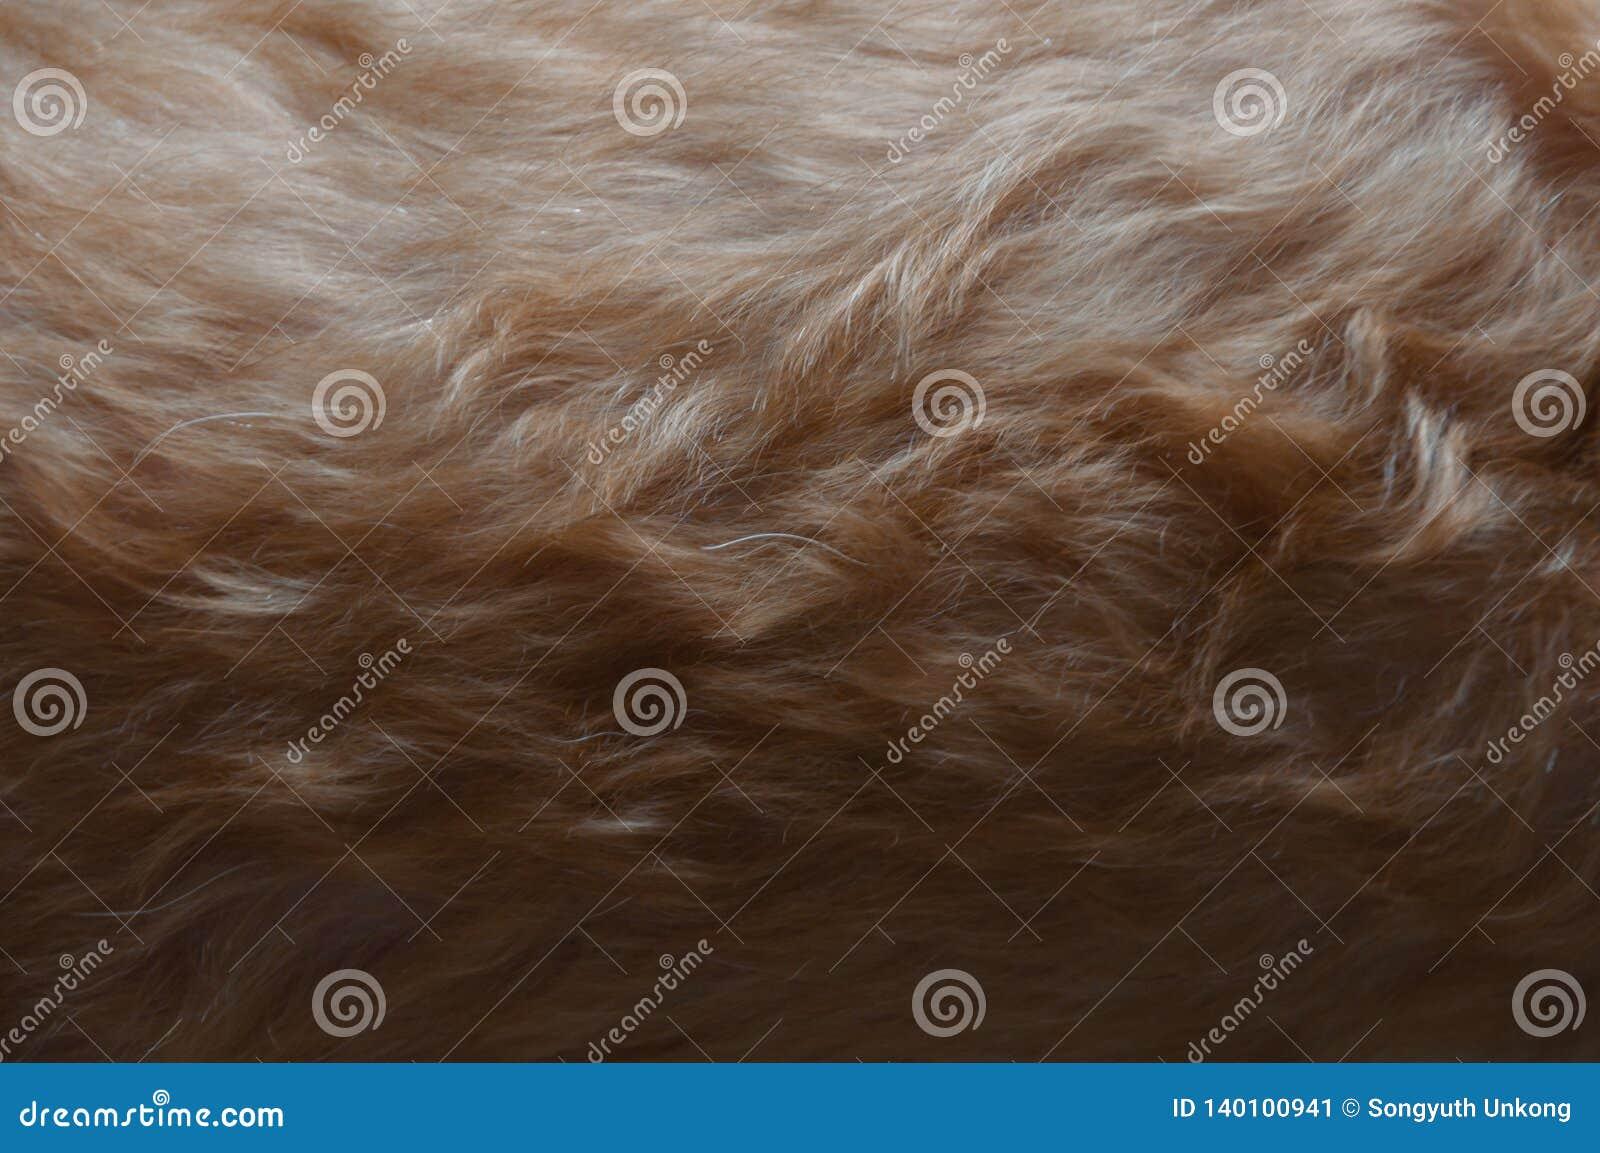 Etwas gelockter beige Farbpelz des Pudelhundes